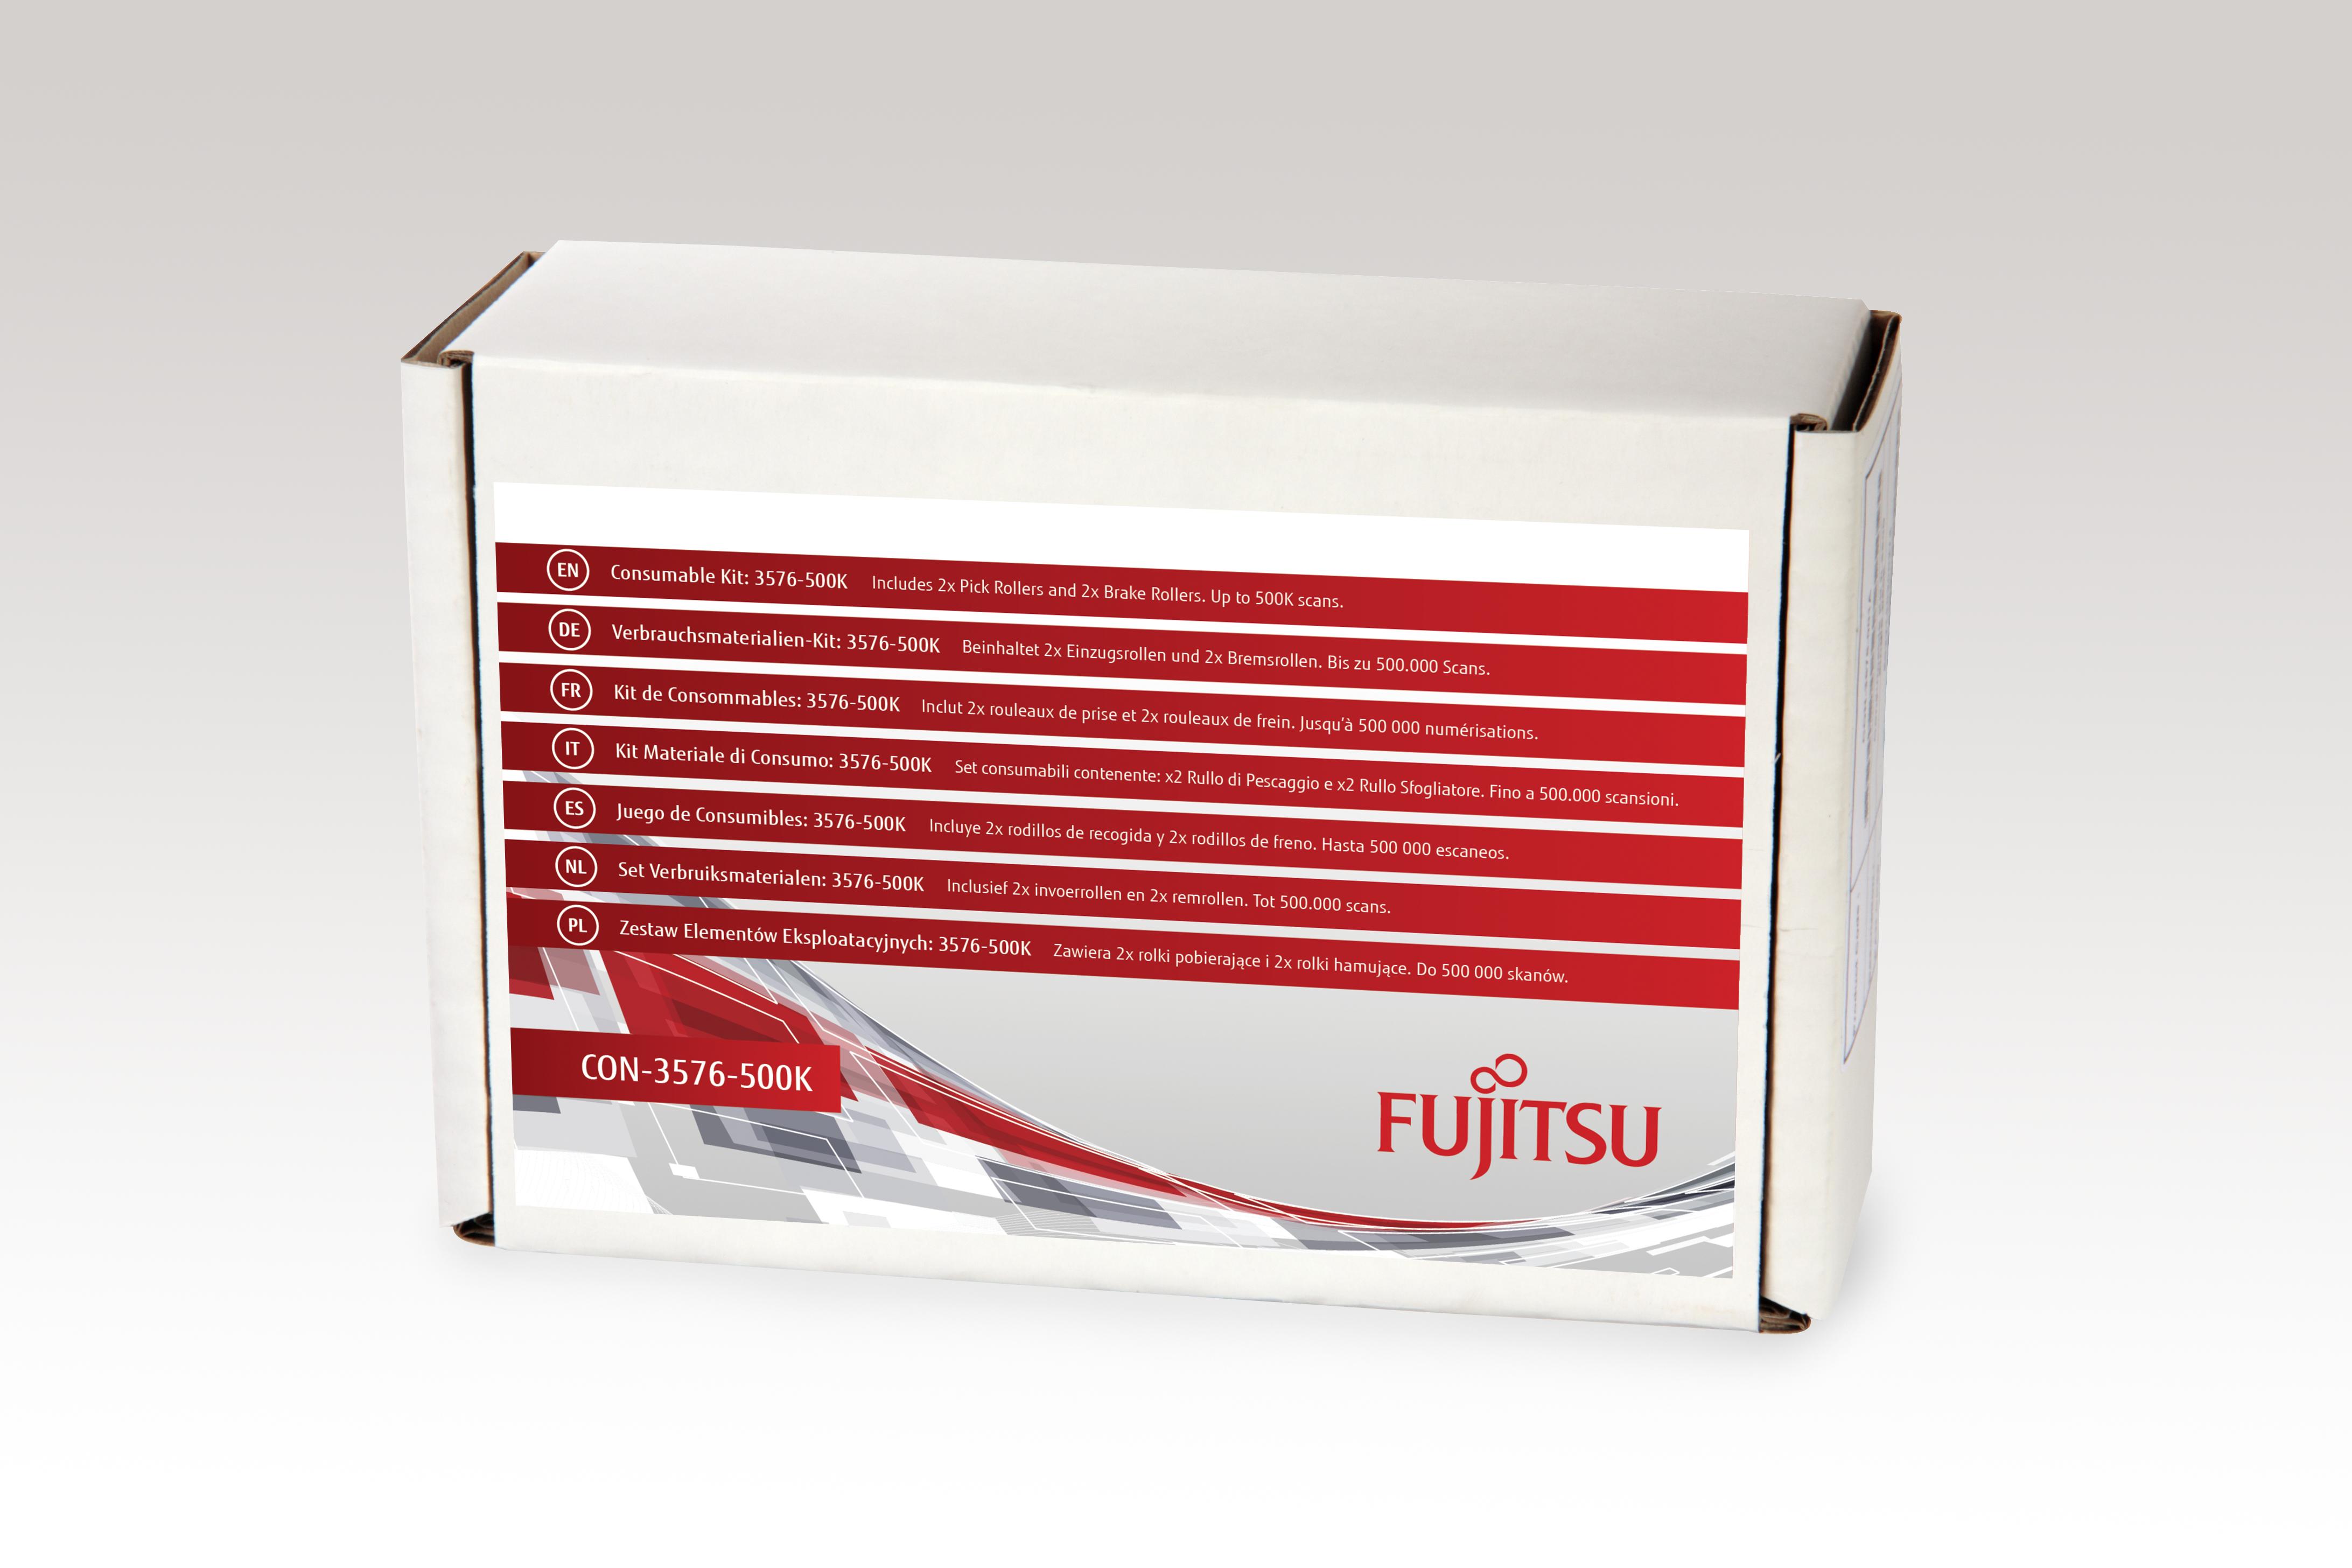 Fujitsu Consumable Kit: 3576-500K - Scanner - Verbrauchsmaterialienkit